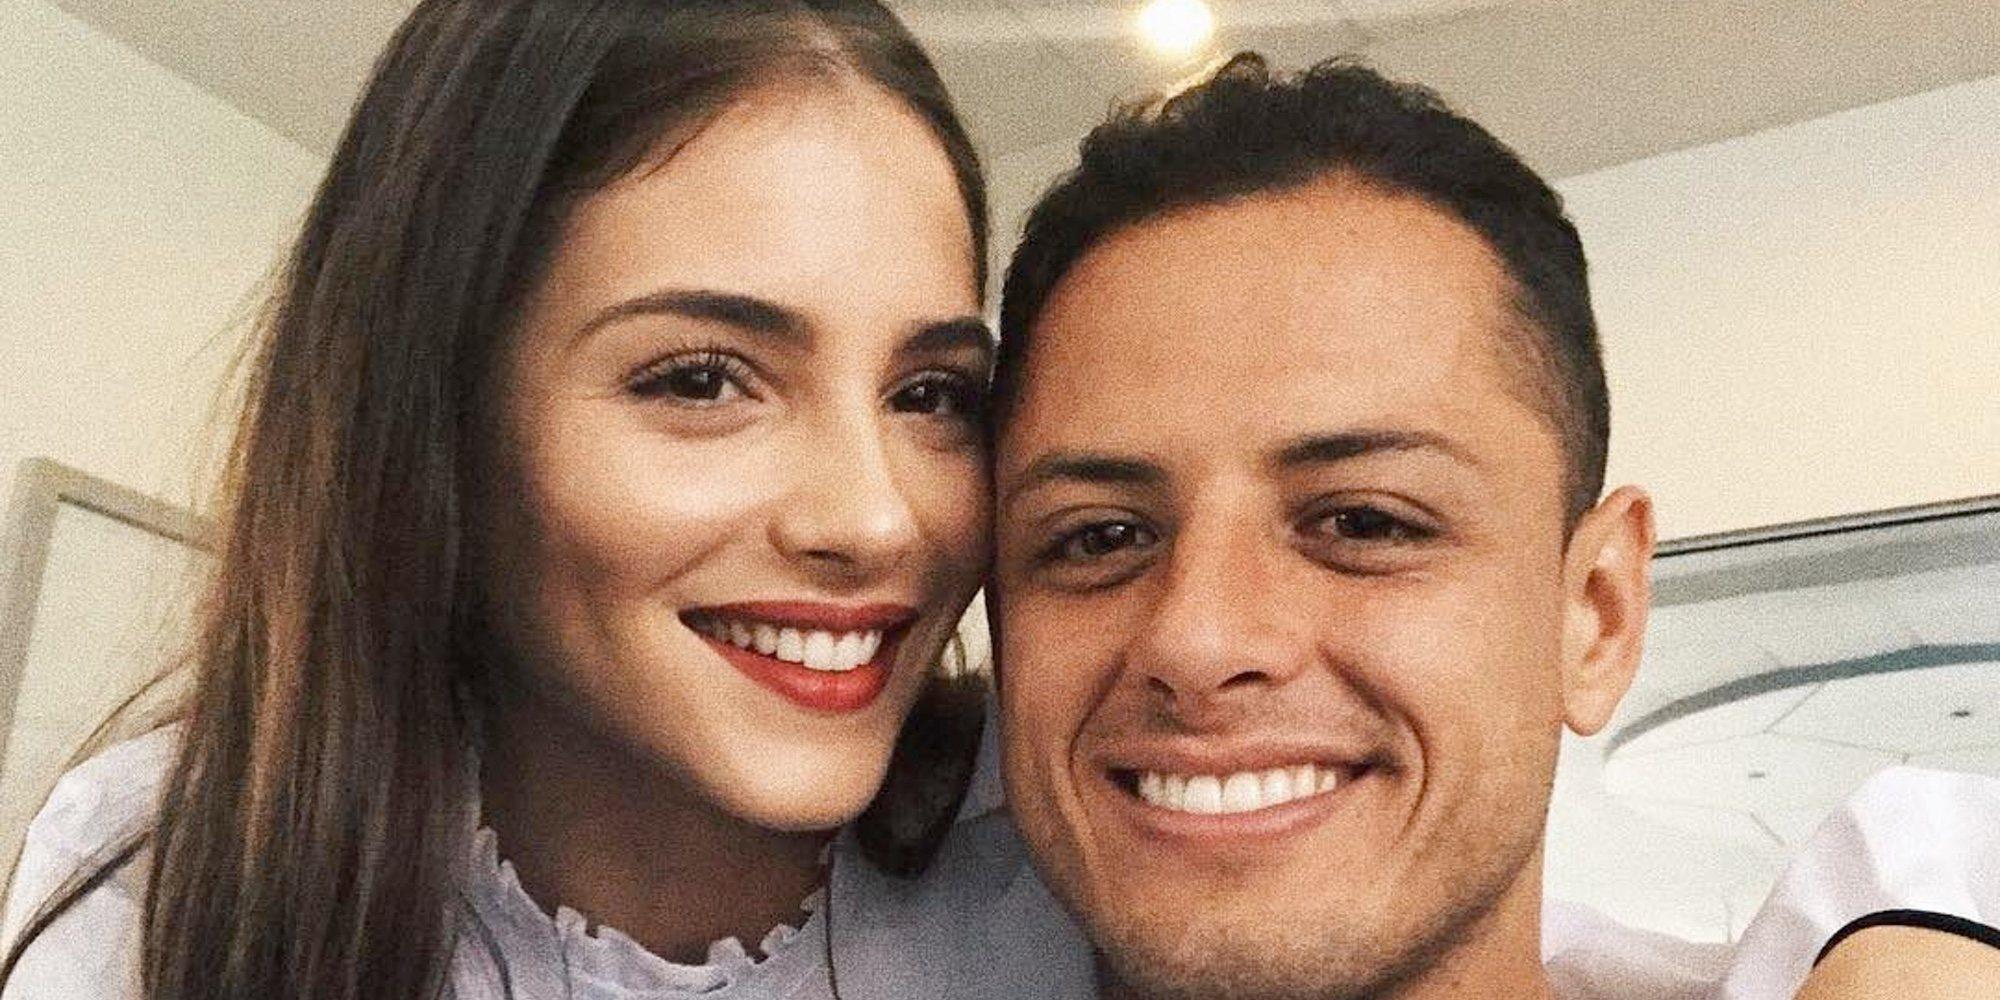 Andrea Duro felicita a Chicharito tras anunciar que será padre junto a Sarah Kohan